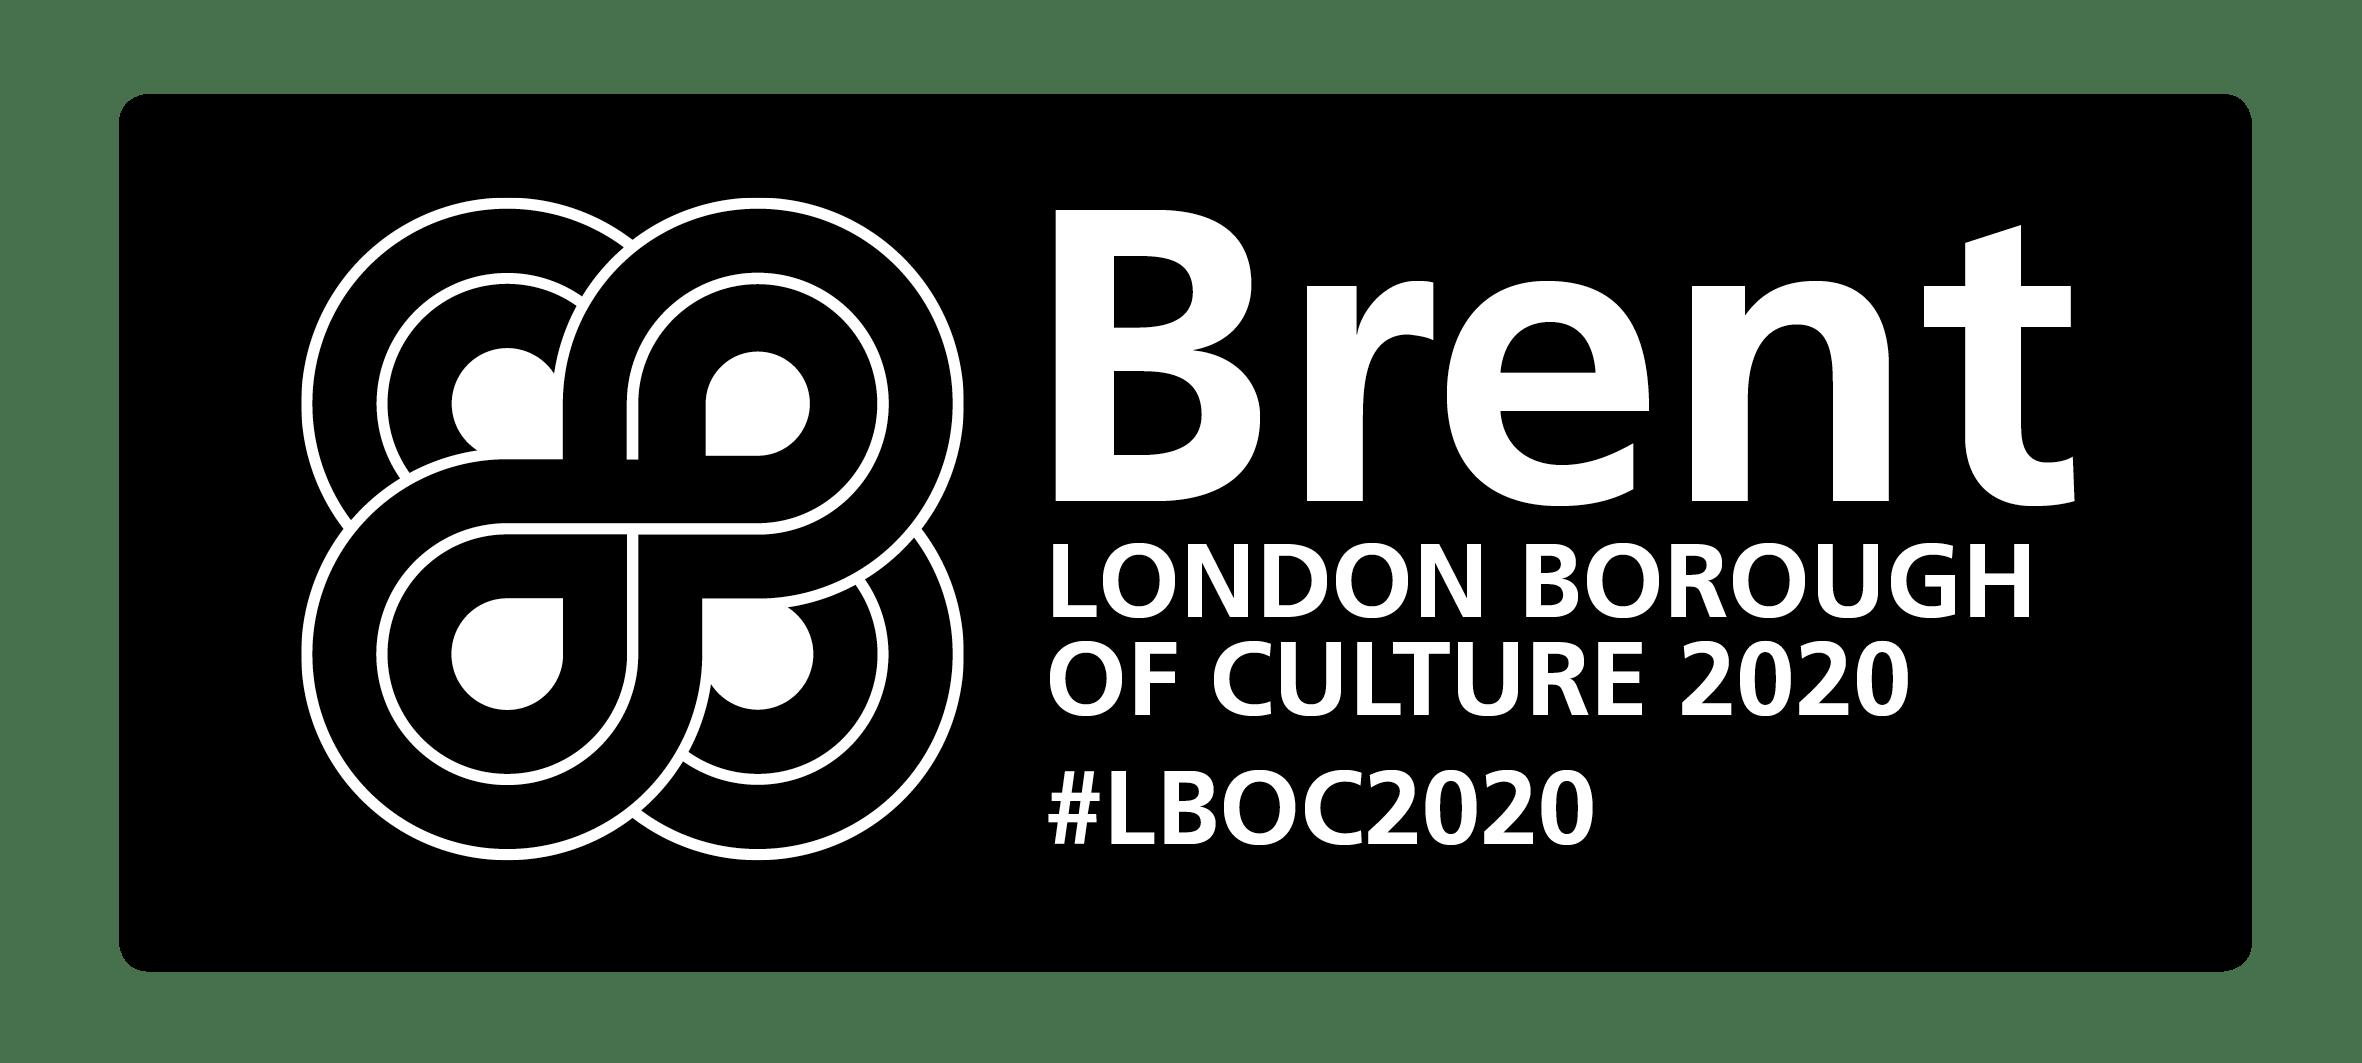 LBOC 2020 Culture Fund Surgery - 21 Feb 2019